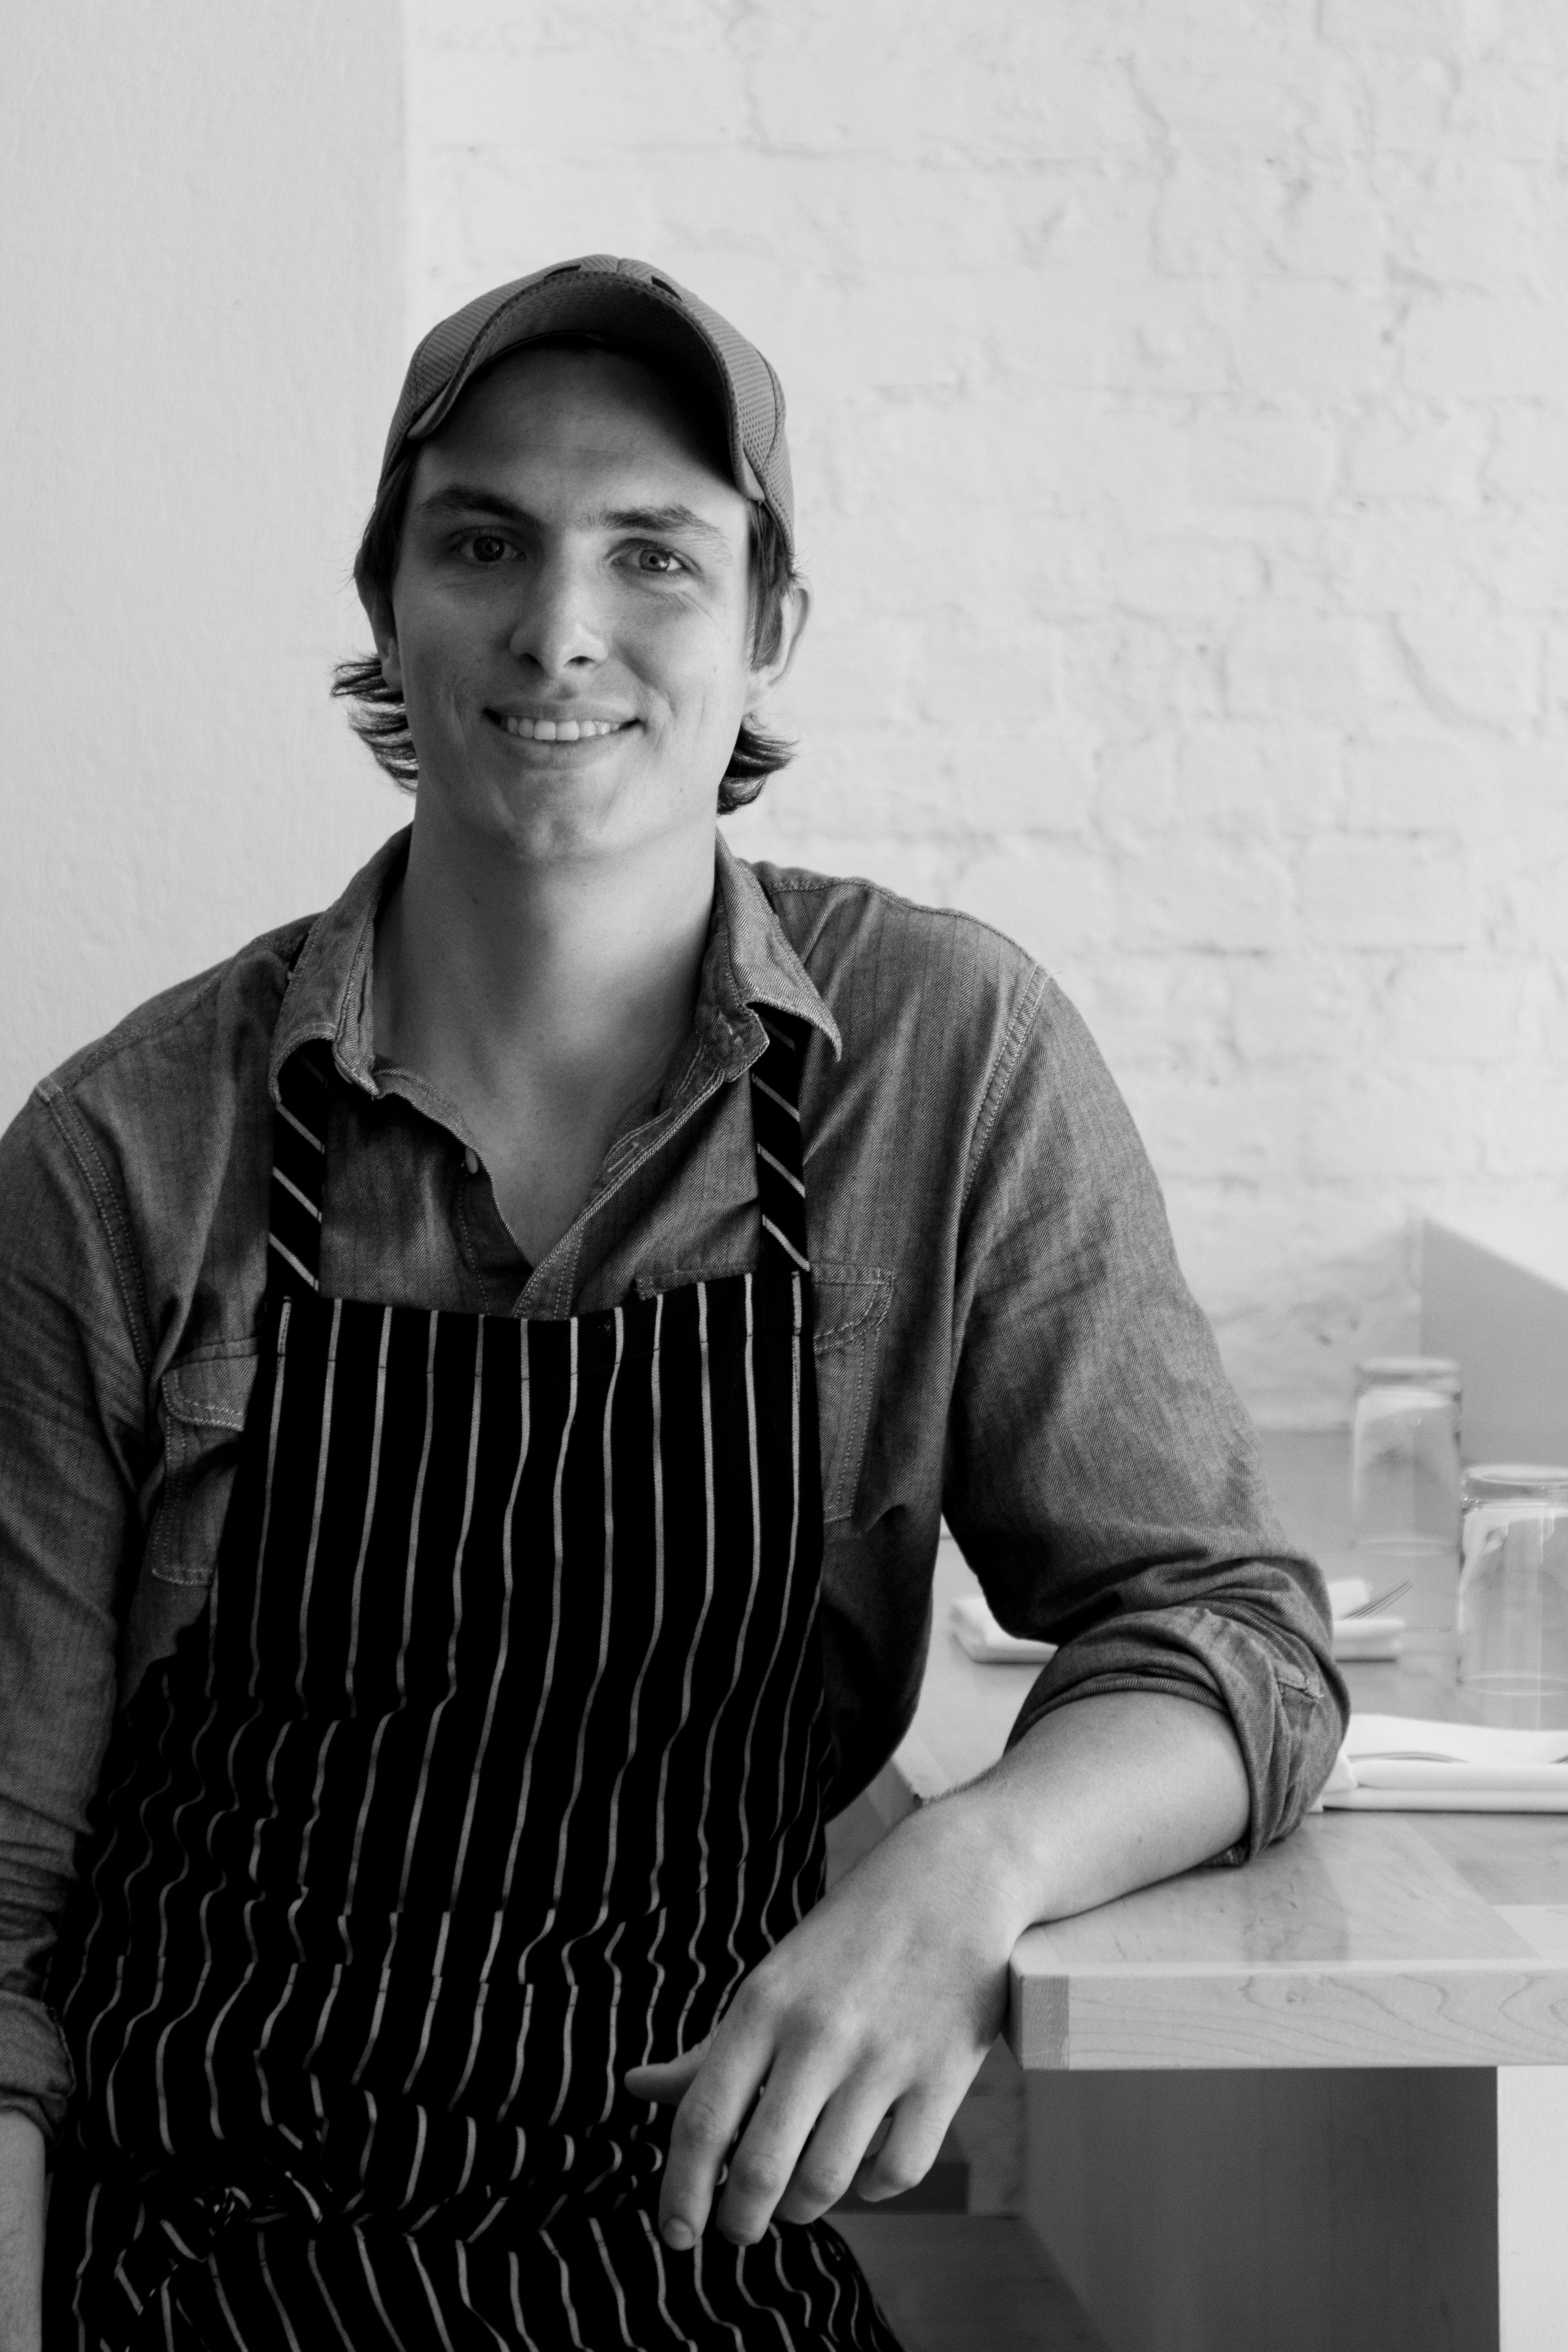 Chef Evan Hanczor